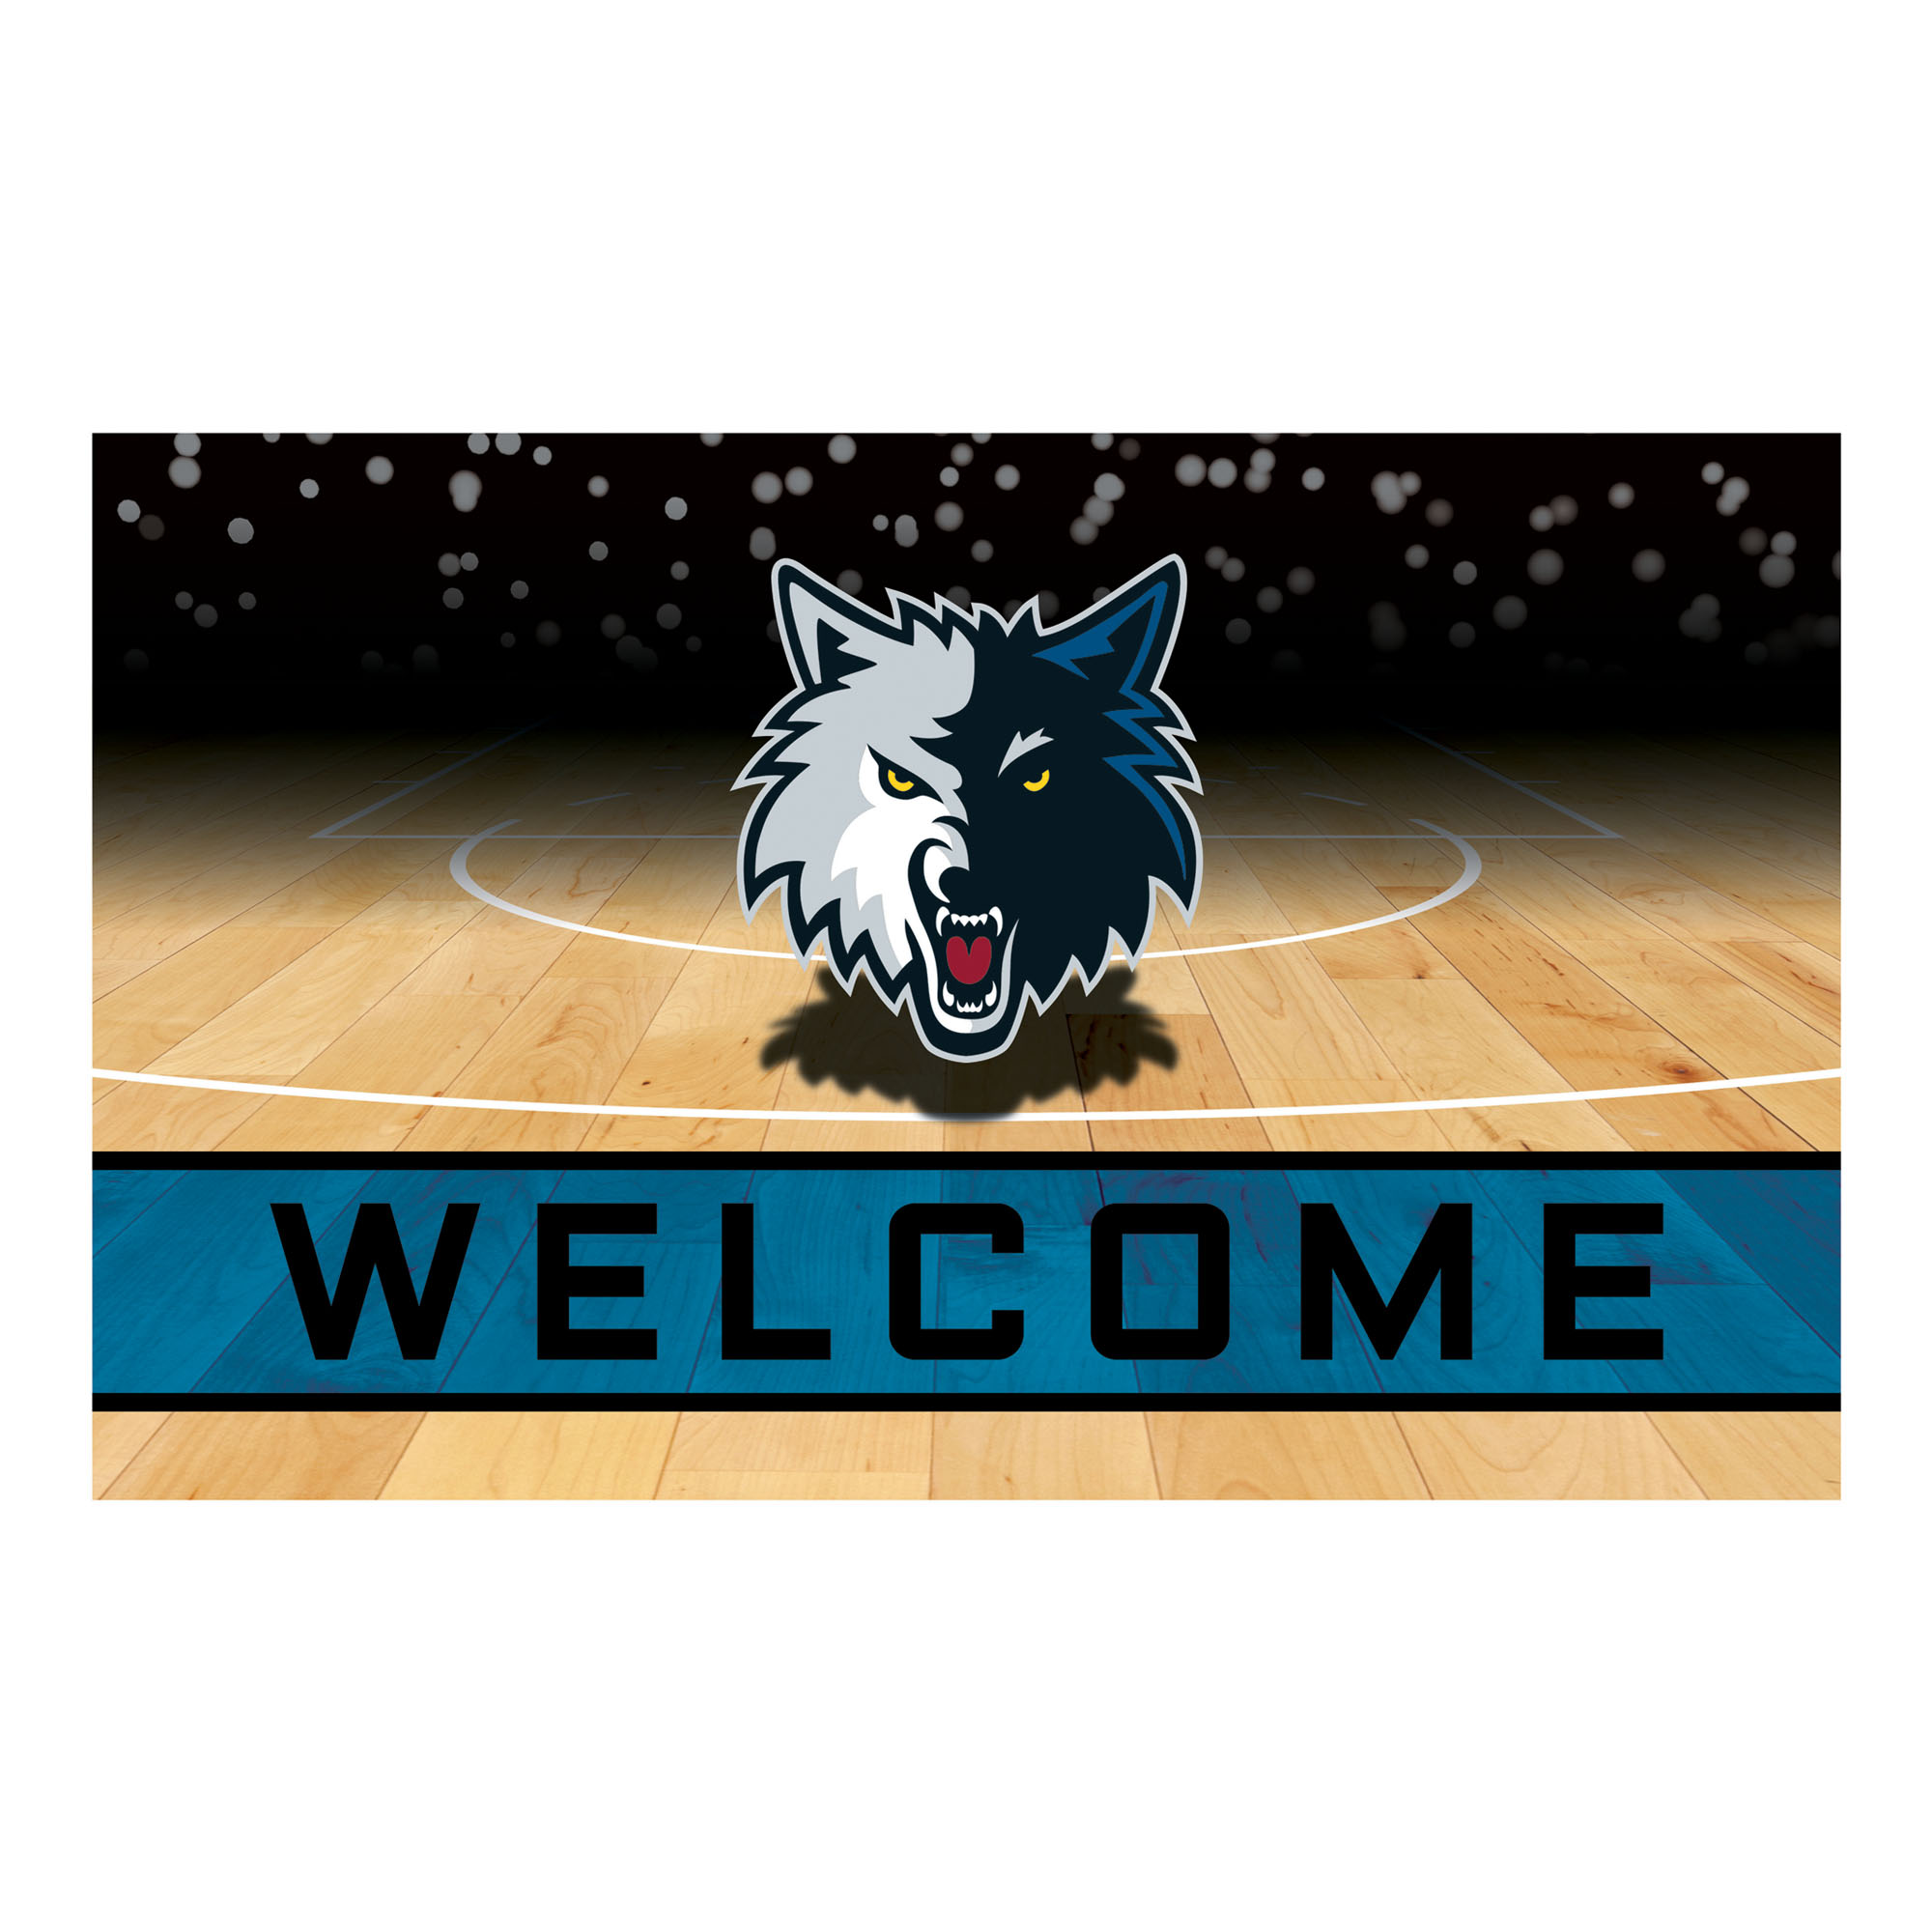 NBA Minnesota Timberwolves Heavy Duty Crumb Rubber Door Mat